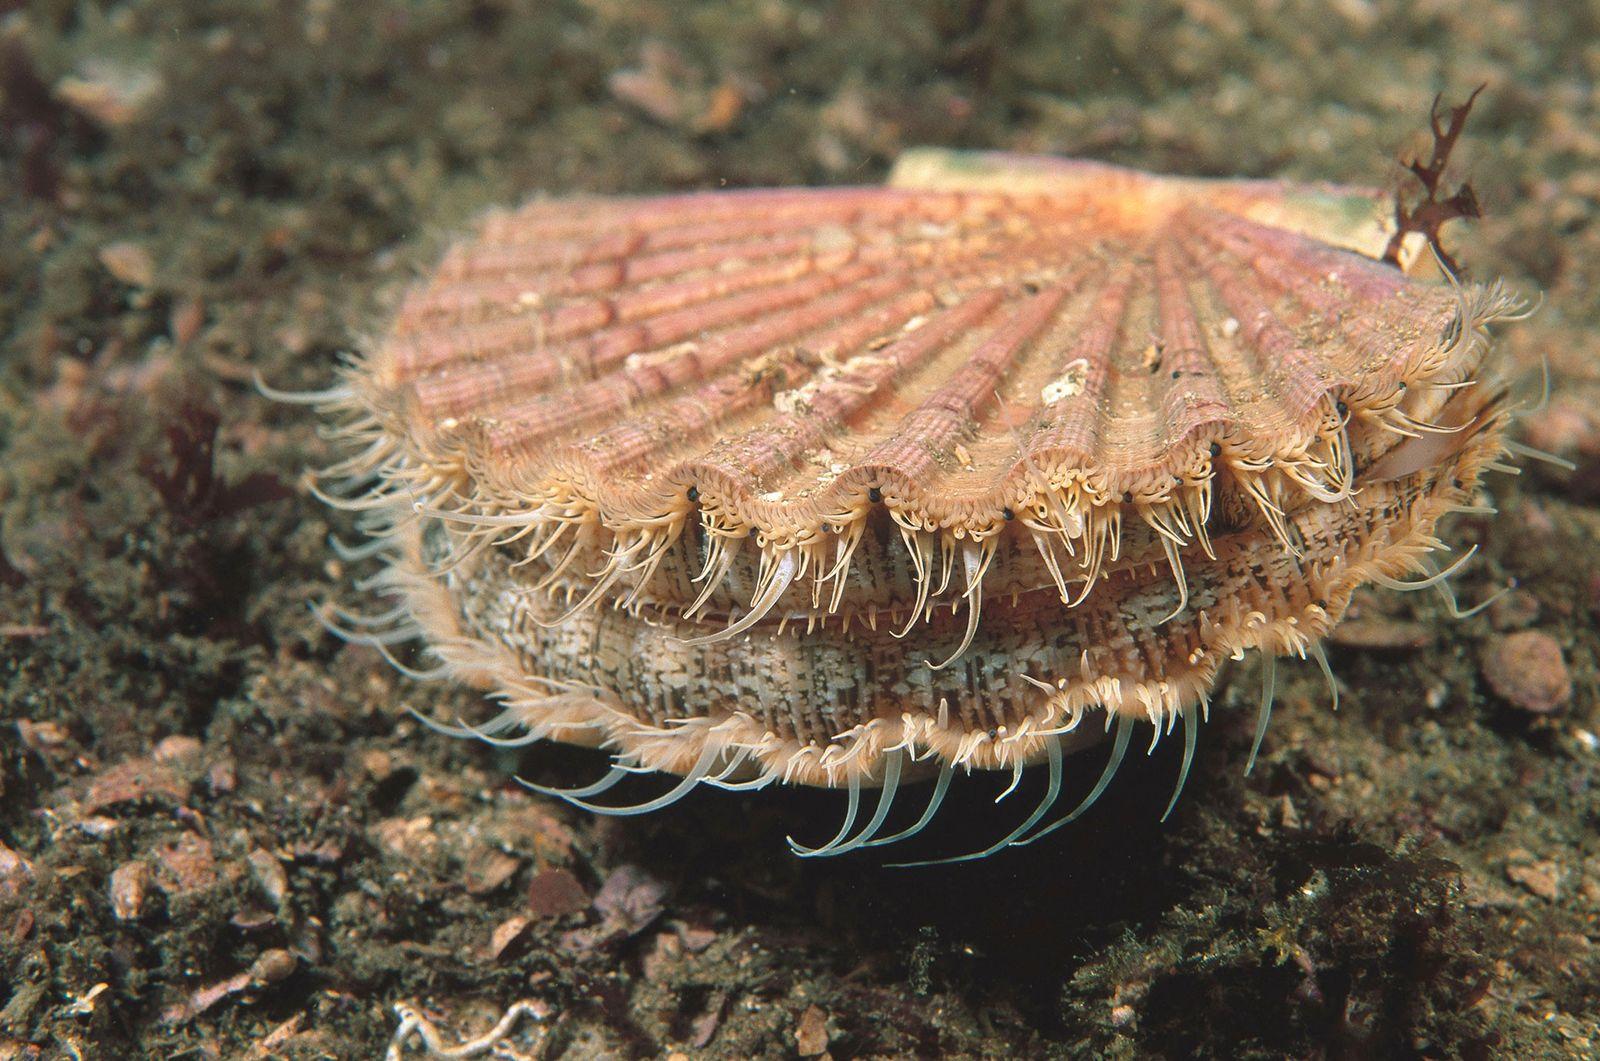 English sea scallops suck up billions of plastic particles